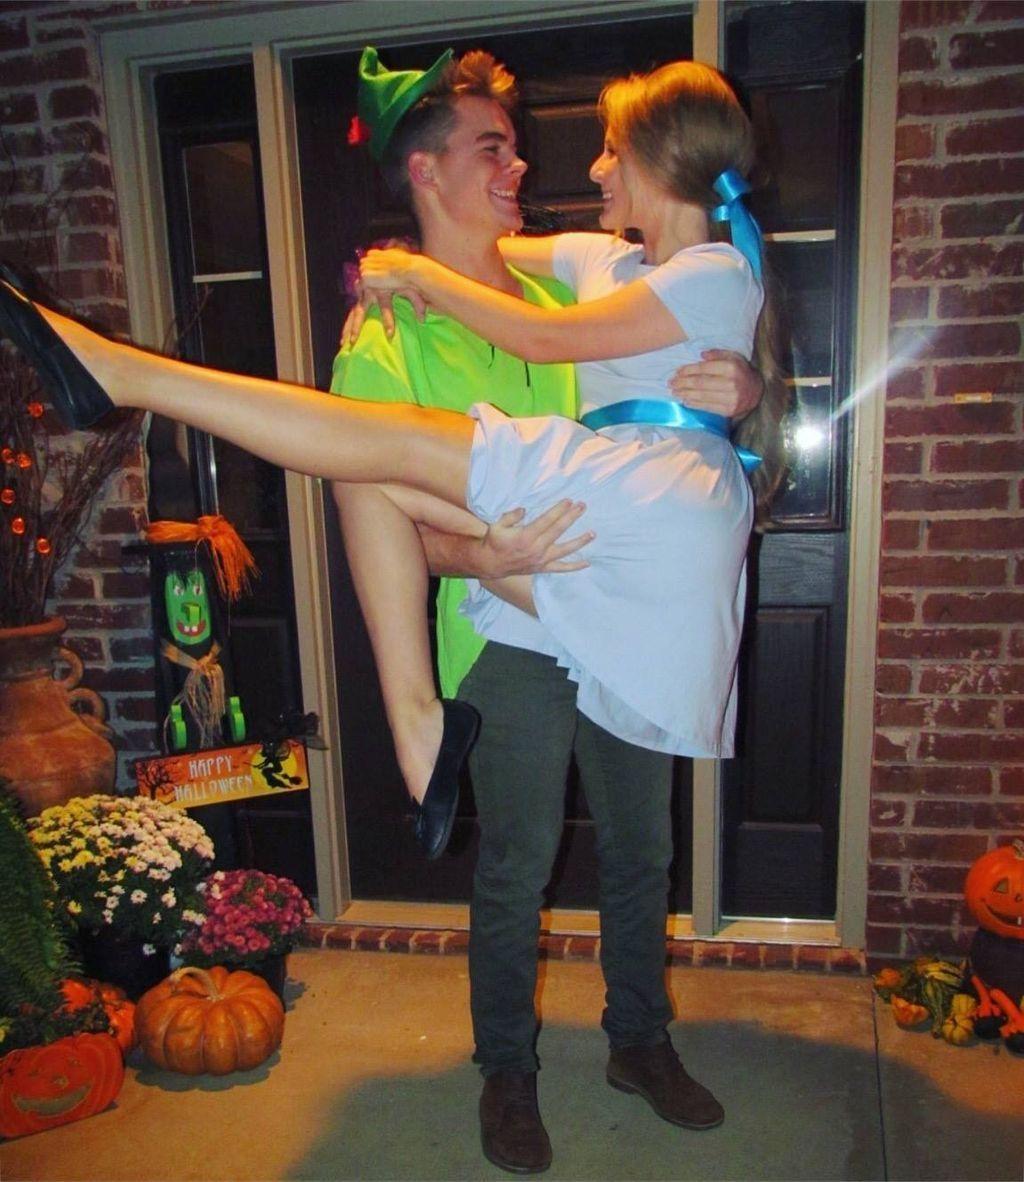 More at //aksahinjewelry.com/2017/10/02/44-unique-creative-halloween- couples-costumes-ideas/  sc 1 st  Pinterest & Cool 44 Unique and Creative Halloween Couples Costumes Ideas. More ...